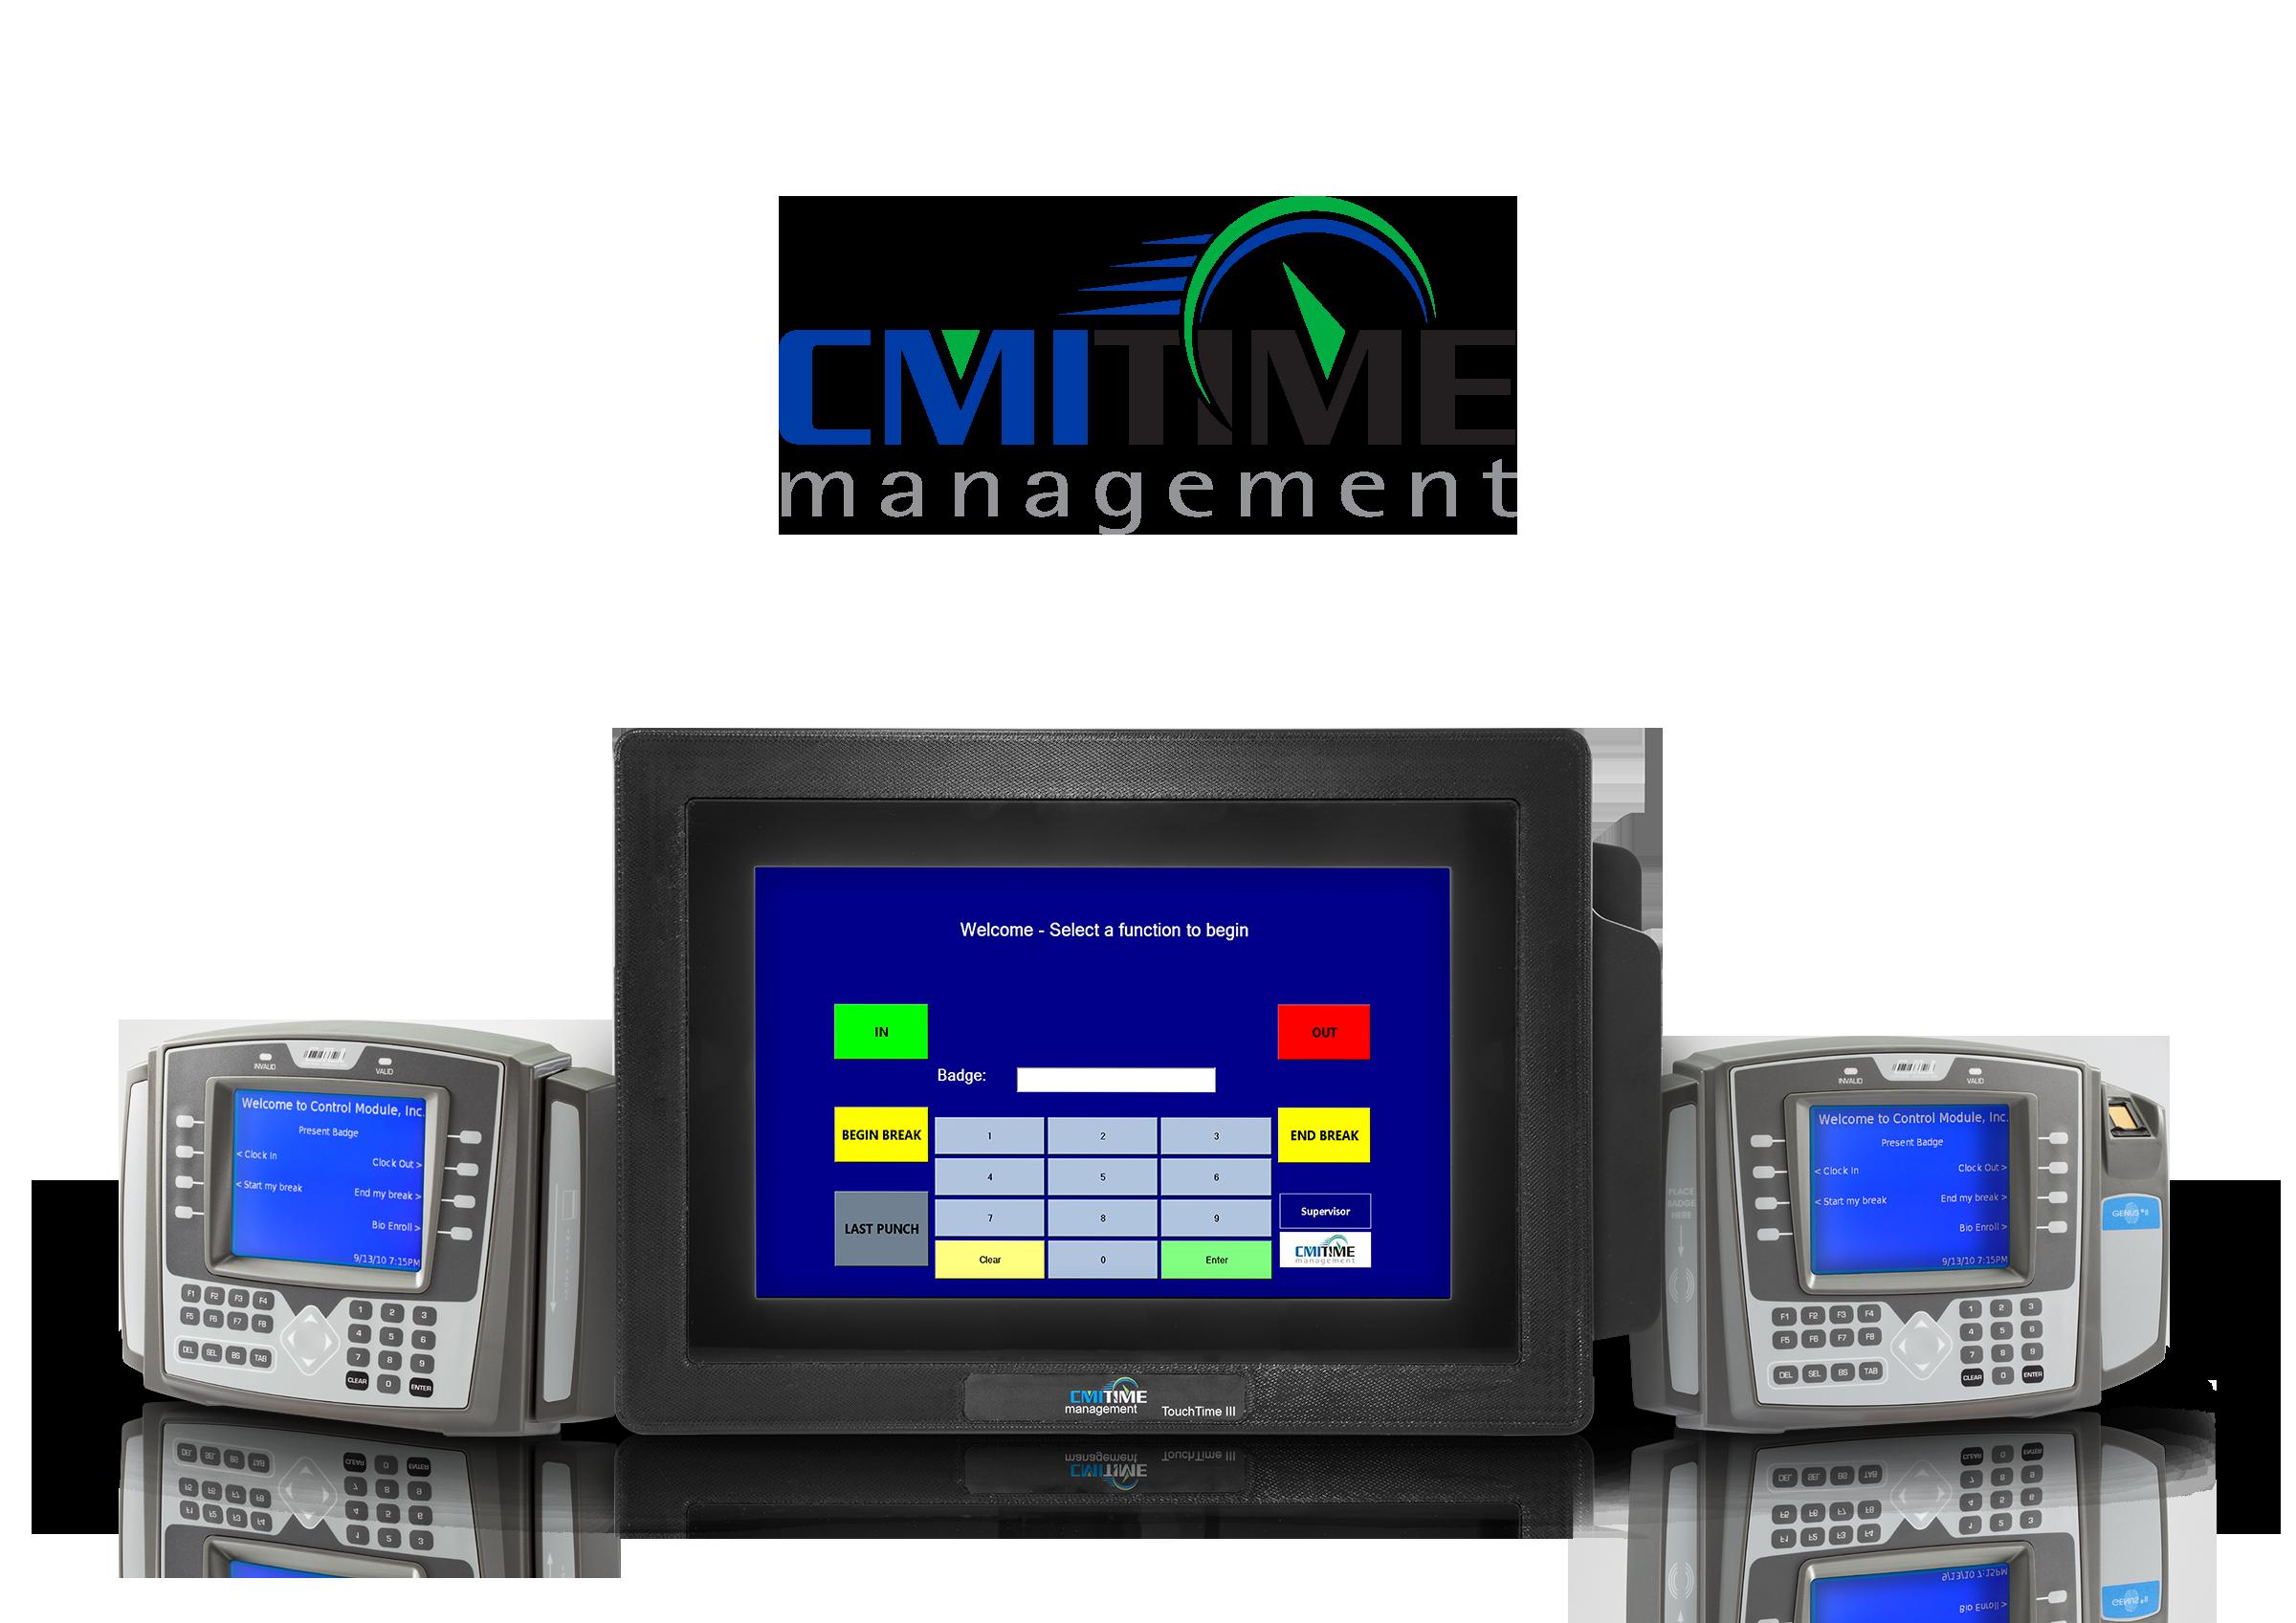 CMI Time